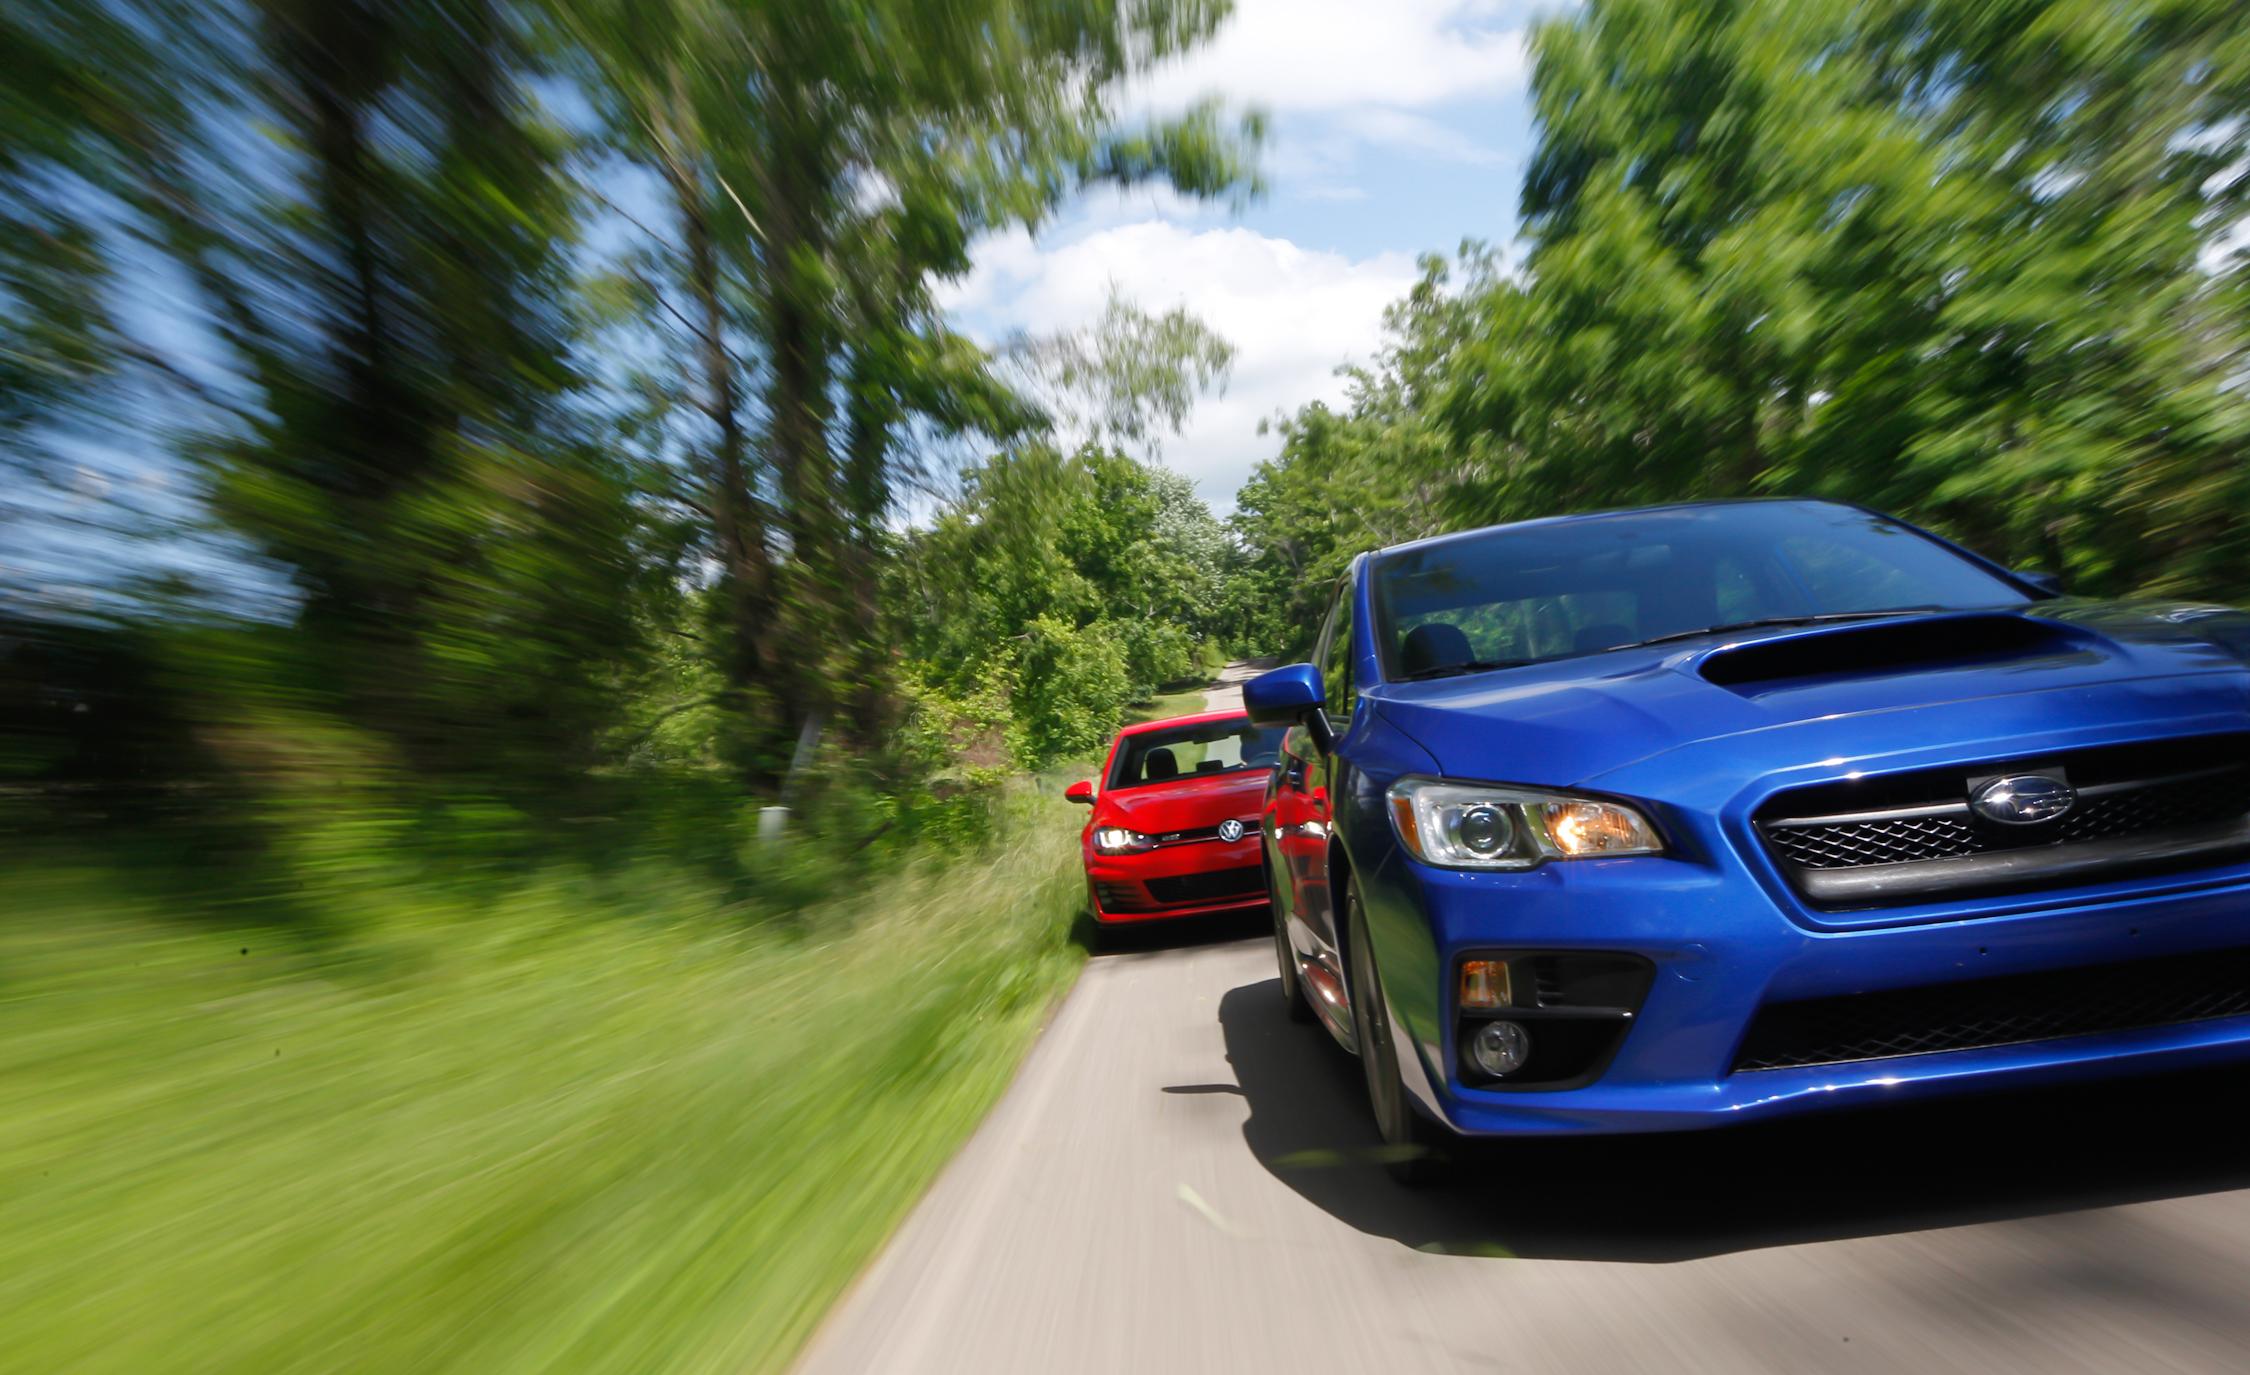 2015 Subaru WRX vs 2015 Volkswagen GTI